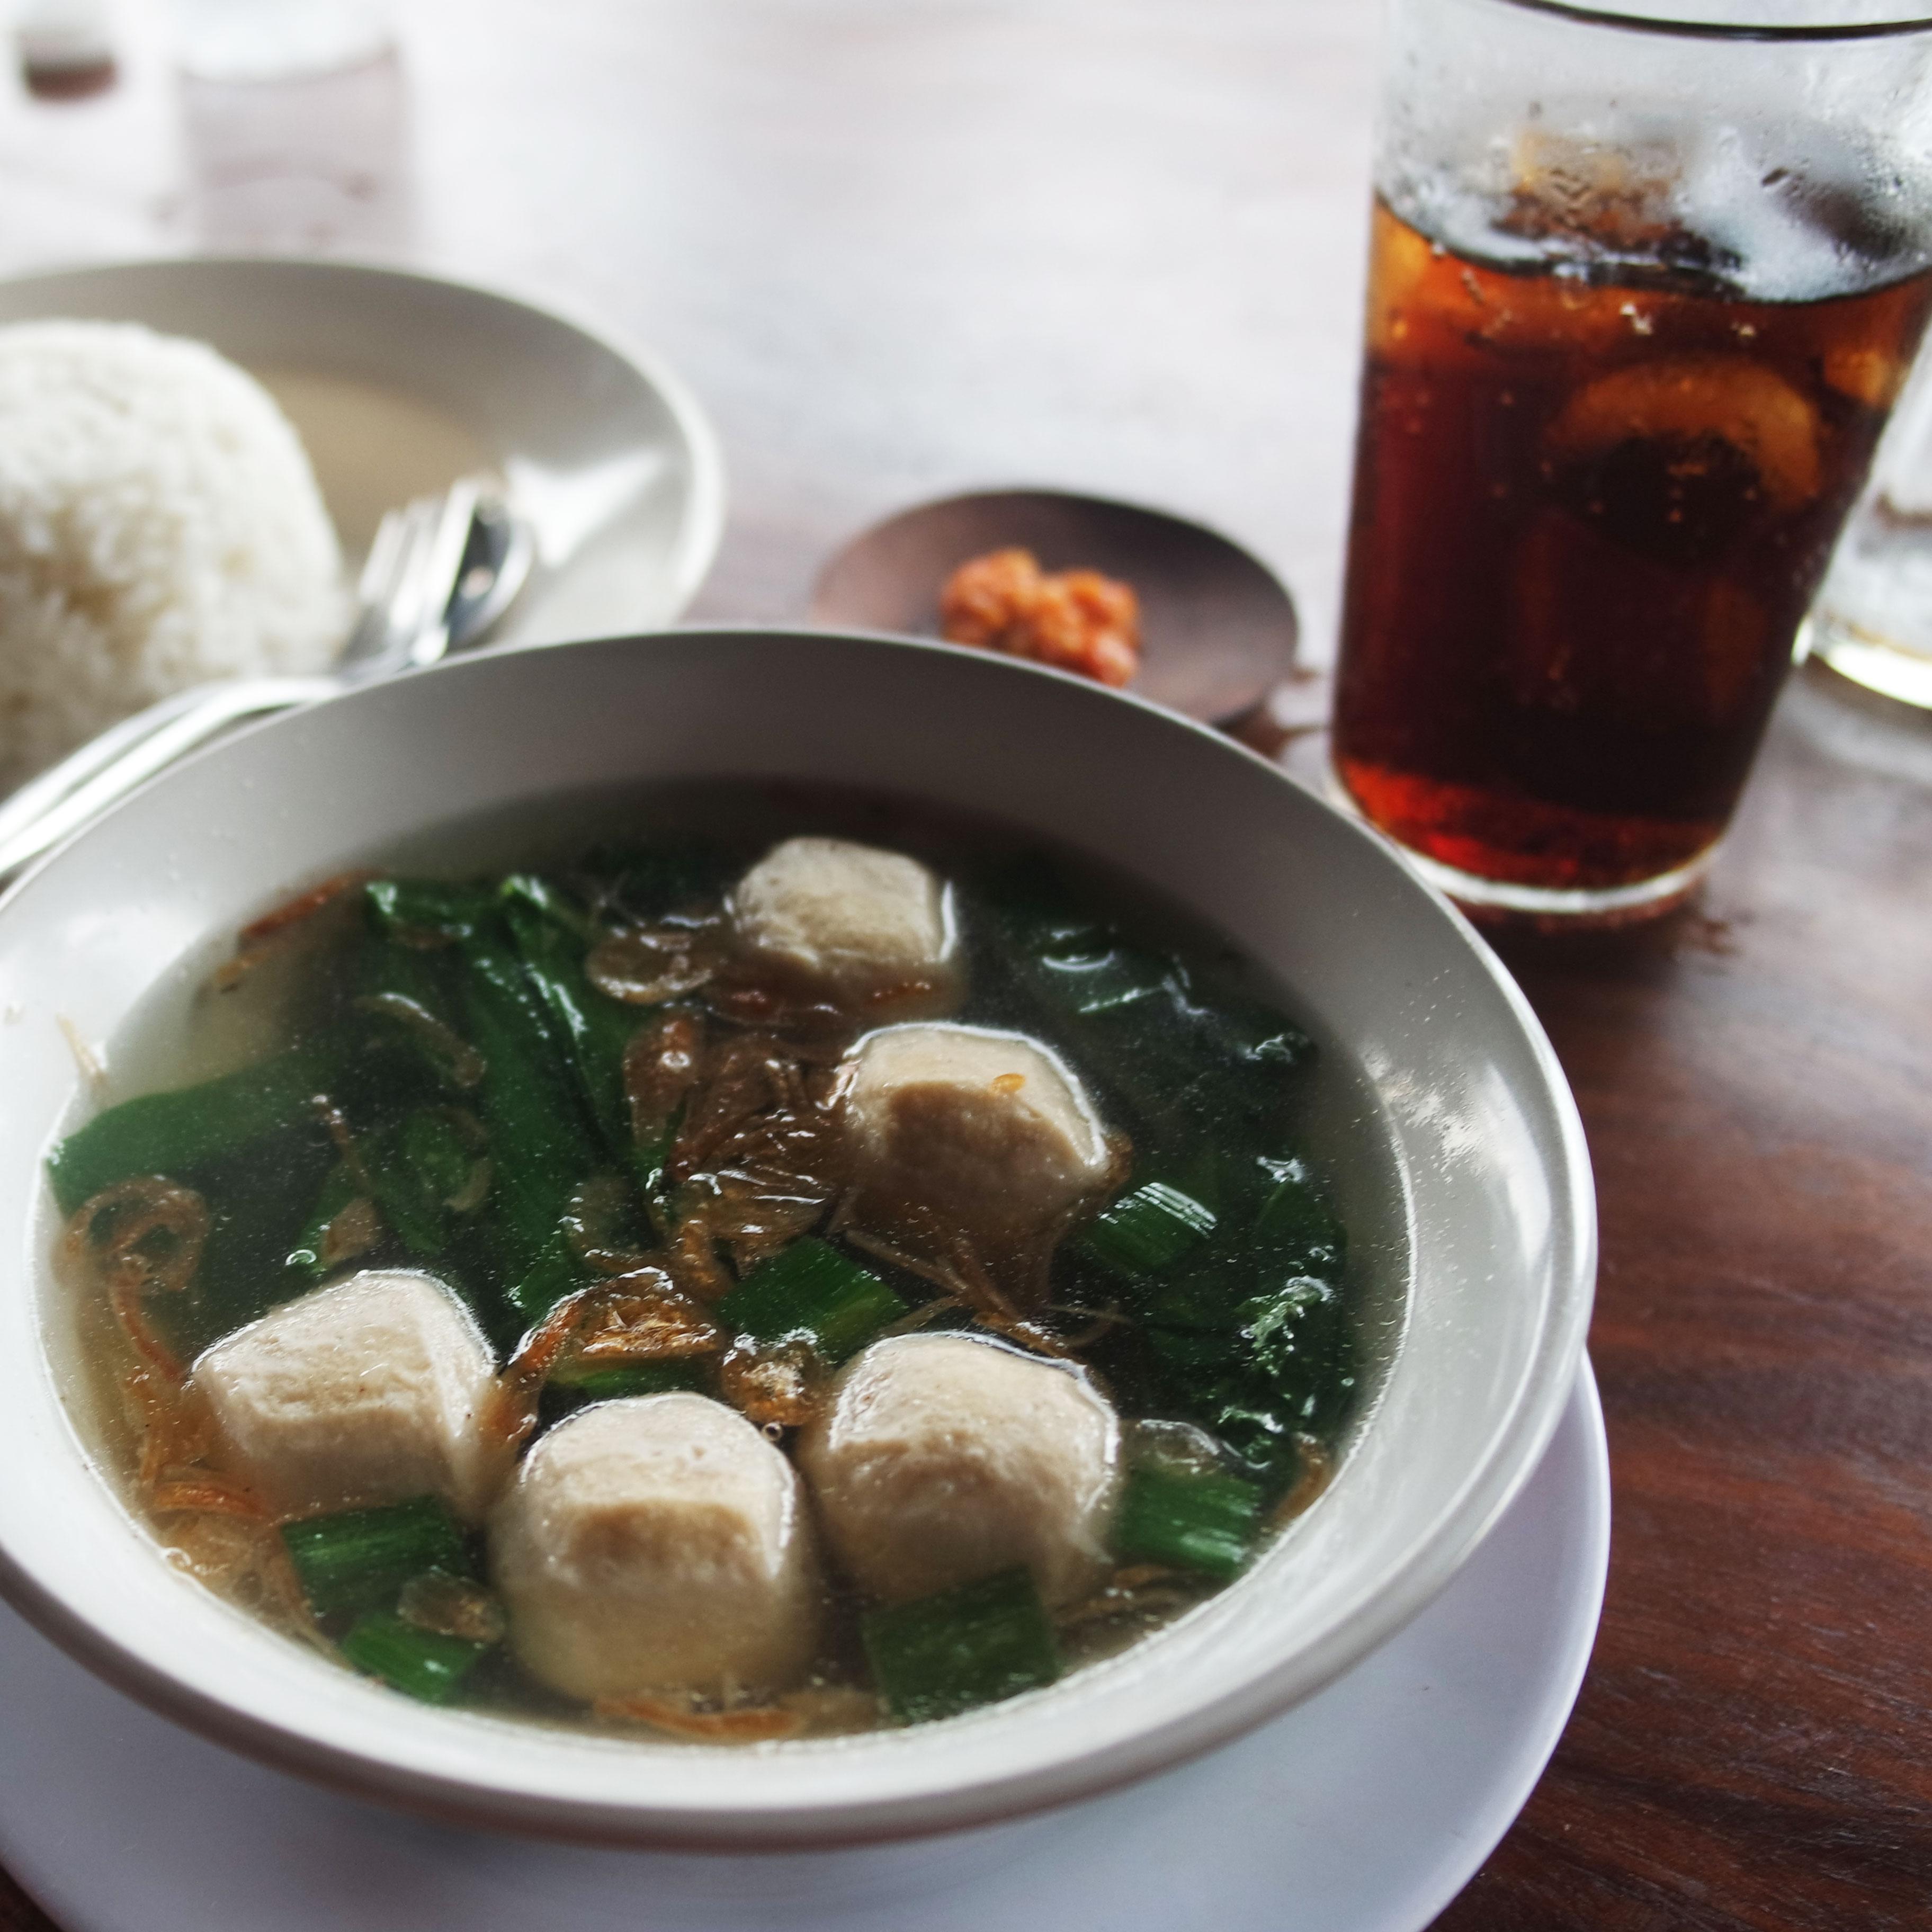 ubud-warung-datas-bbq-ribs-bali-restaurant-blog-avis